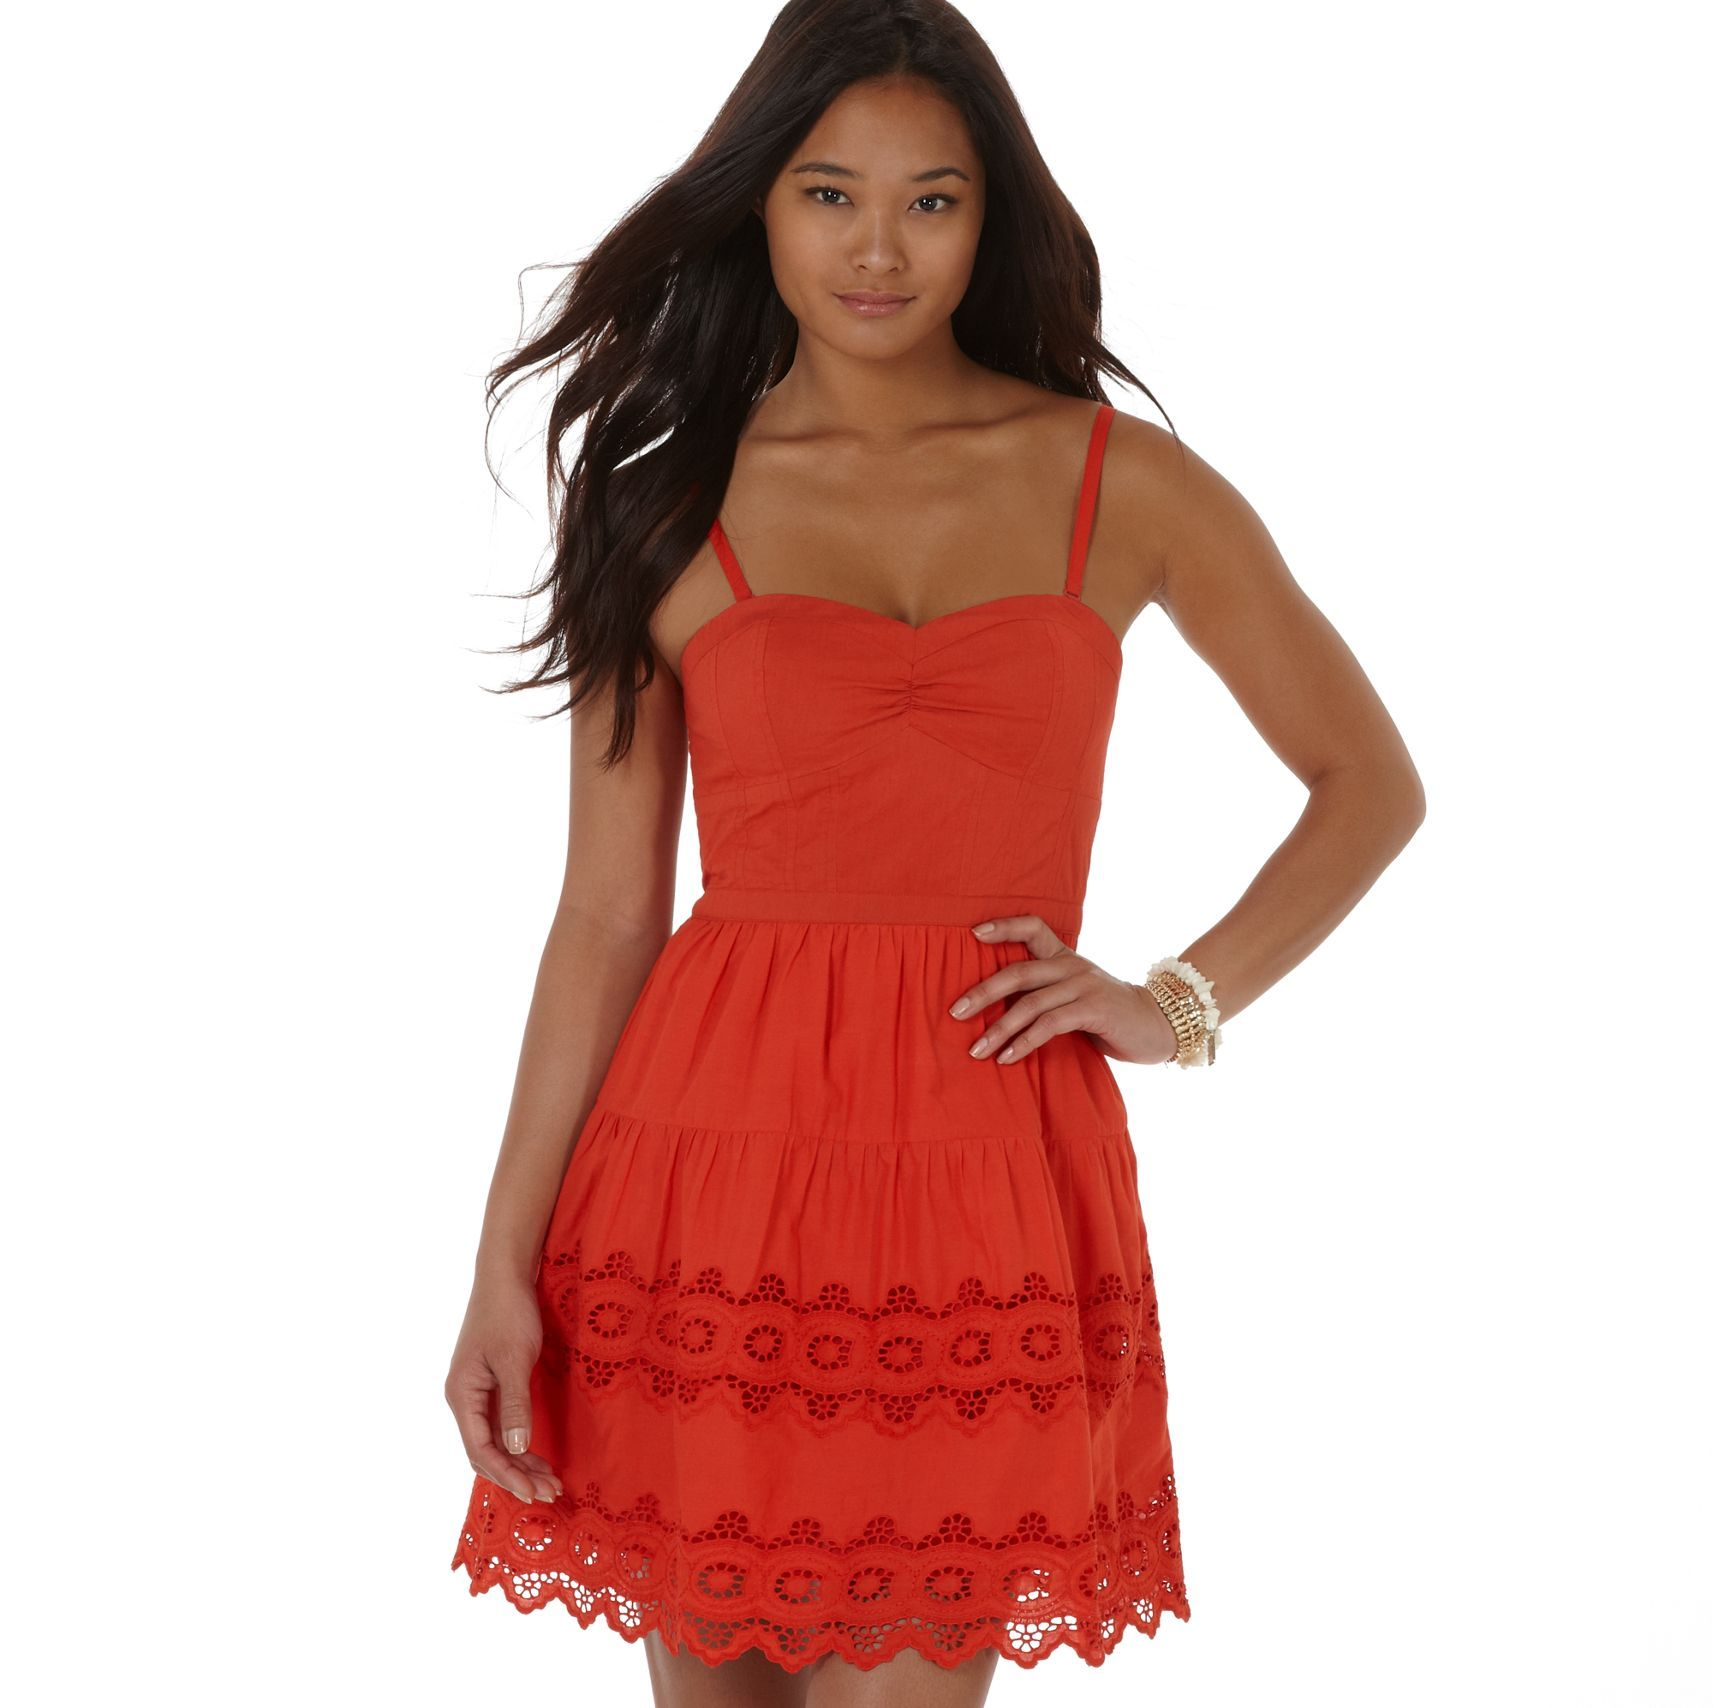 44e3f874803 I feel like an indie goddess when I wear this dress.